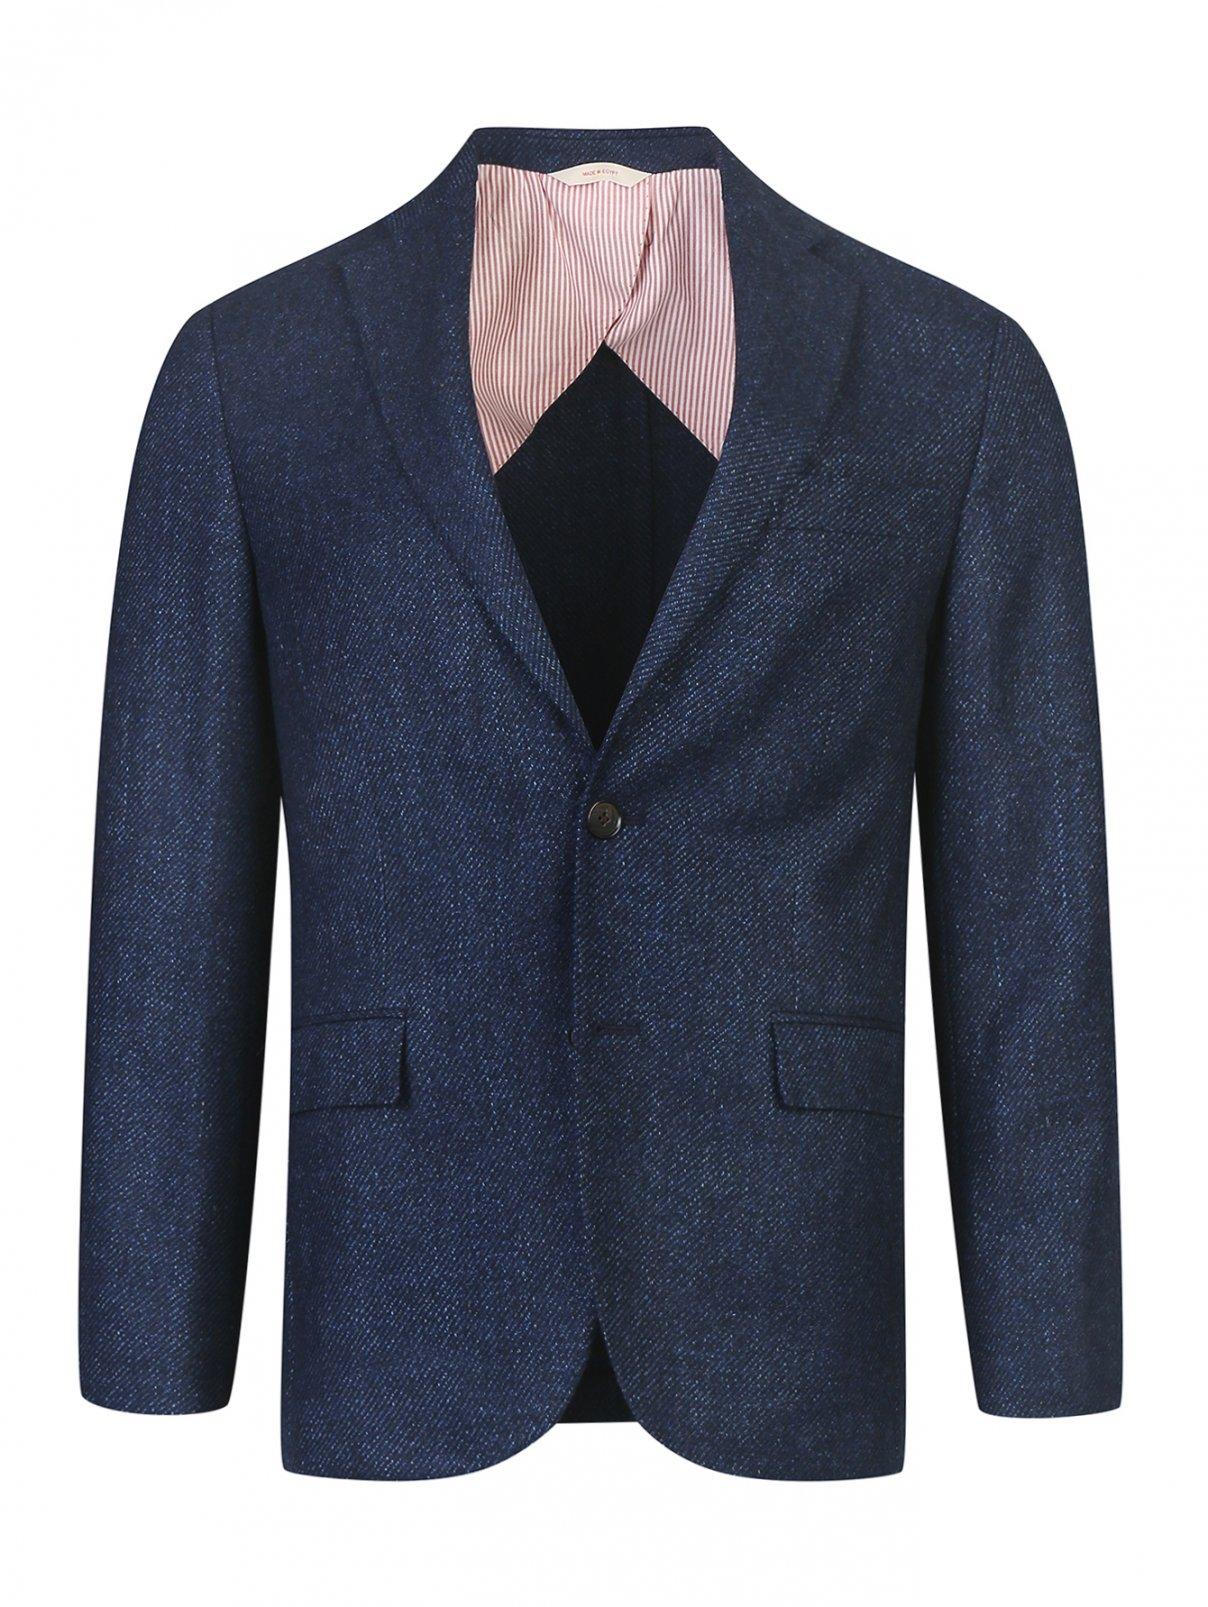 Пиджак из шерсти и шелка с узором Brooks Brothers  –  Общий вид